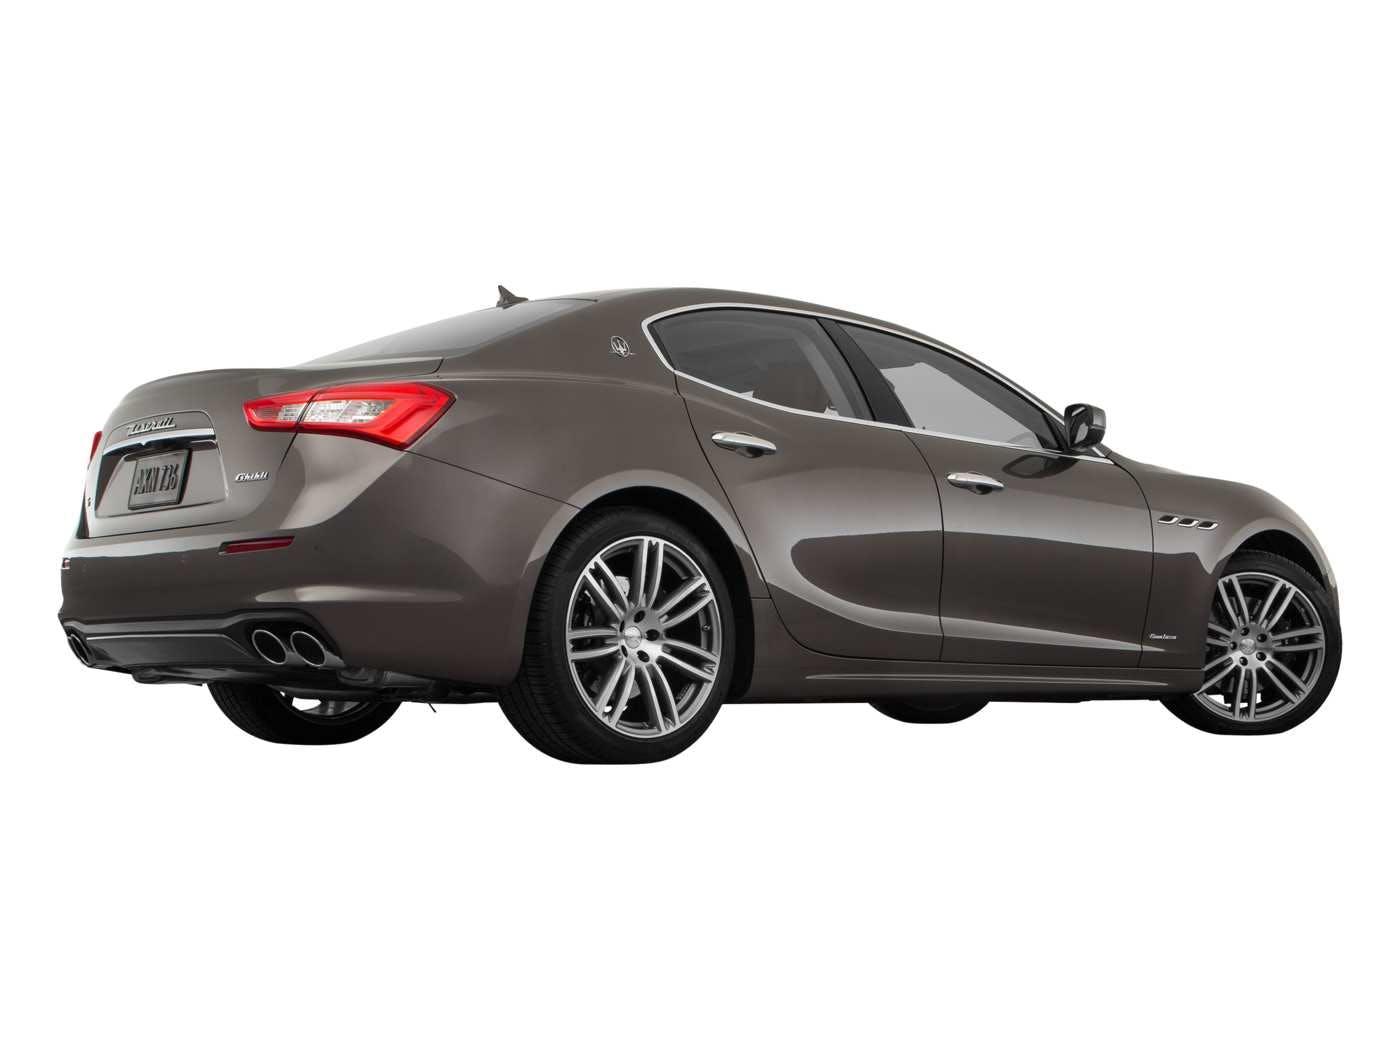 2019 Maserati Ghibli Exterior Back Low Wide View 2